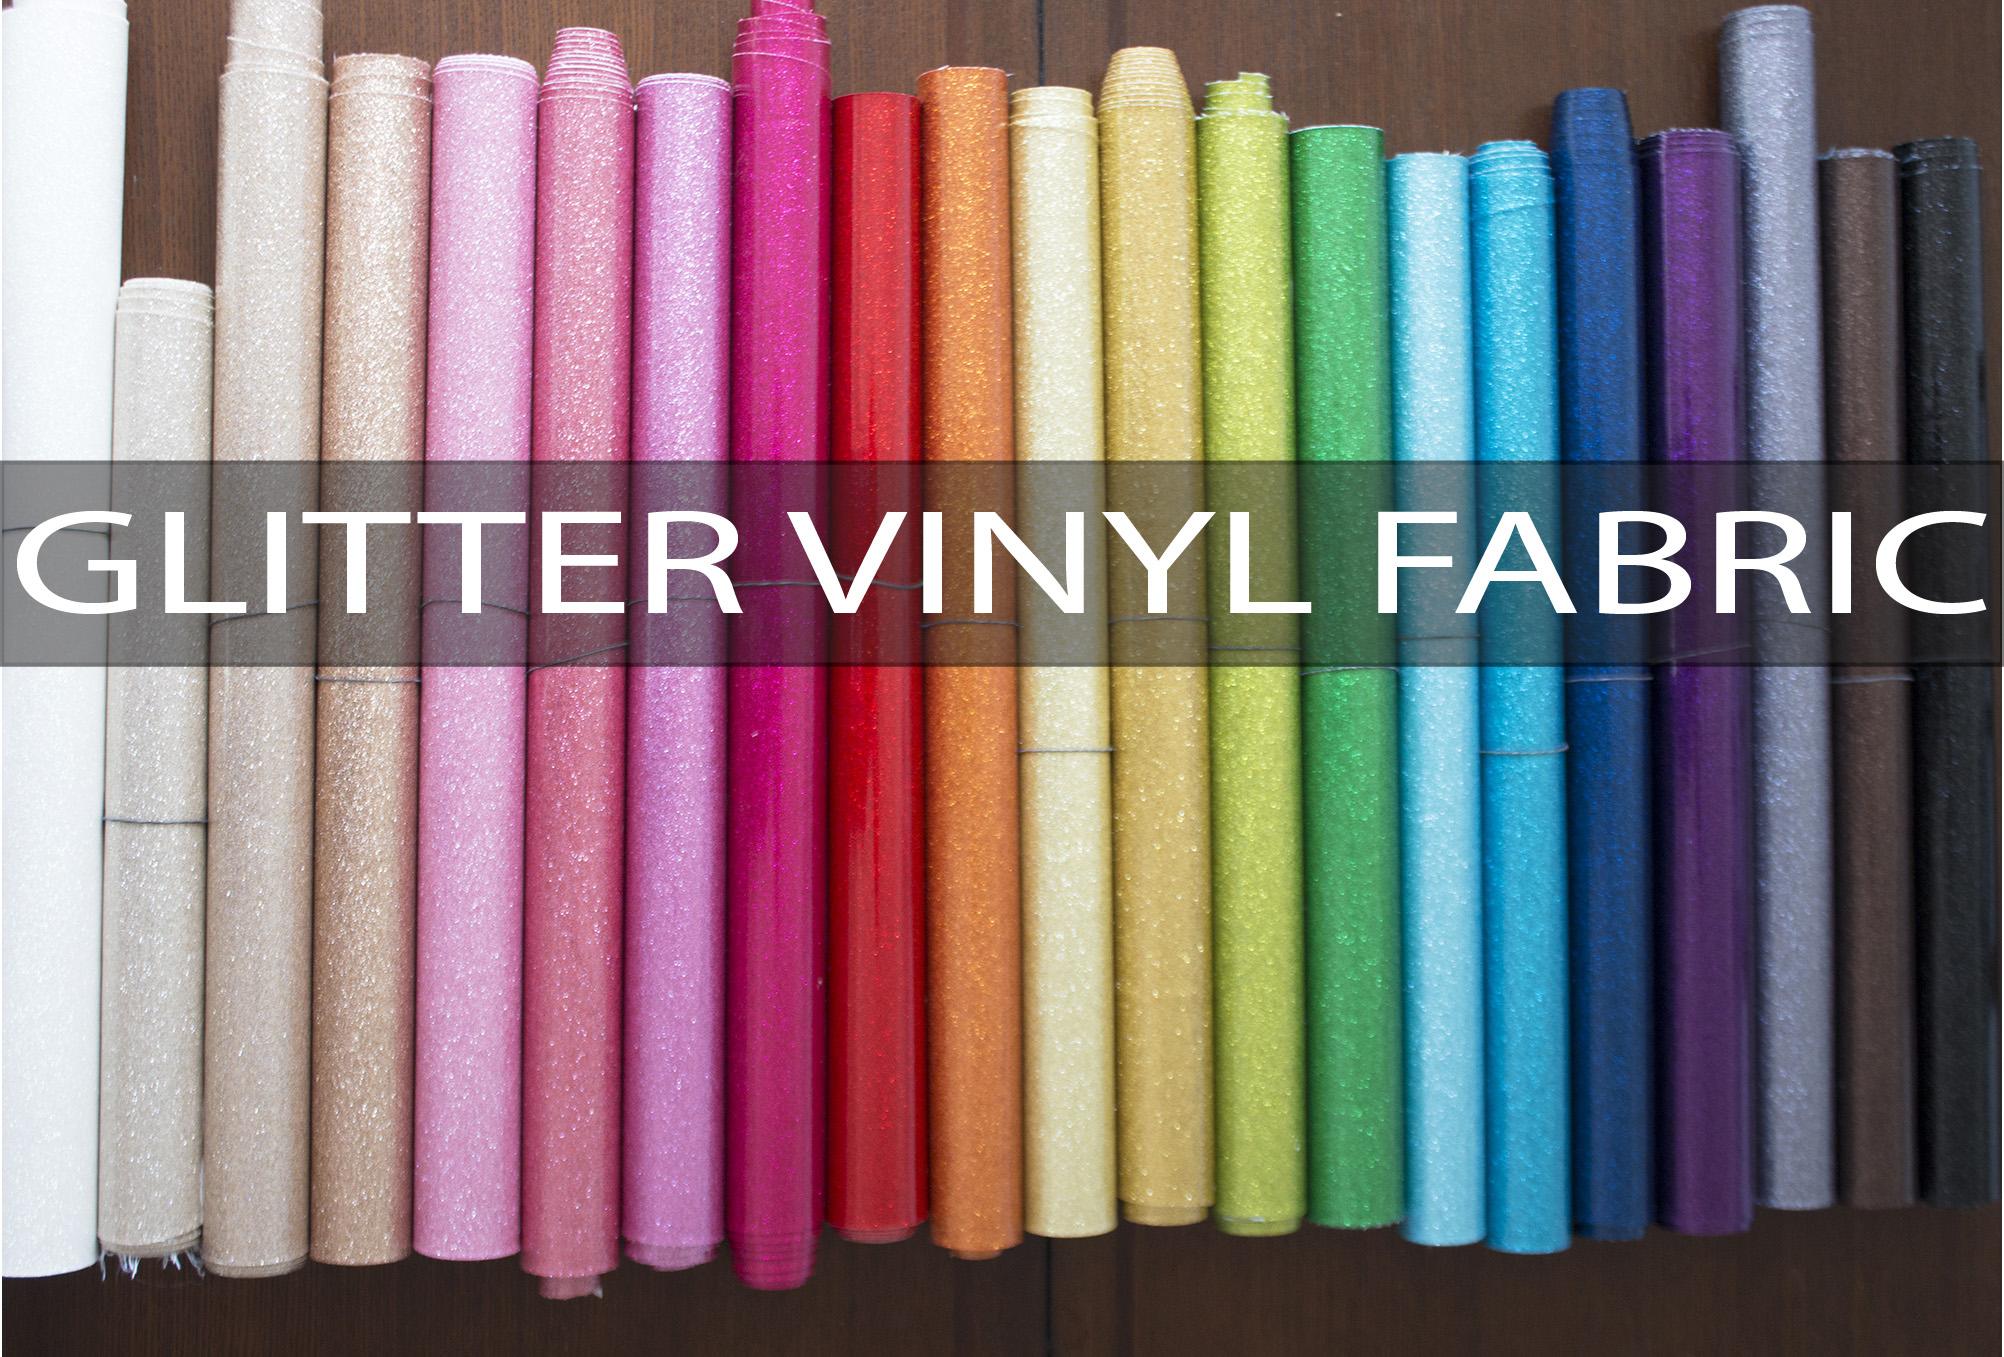 Glitter Vinyl Fabric from Sew Sweetness